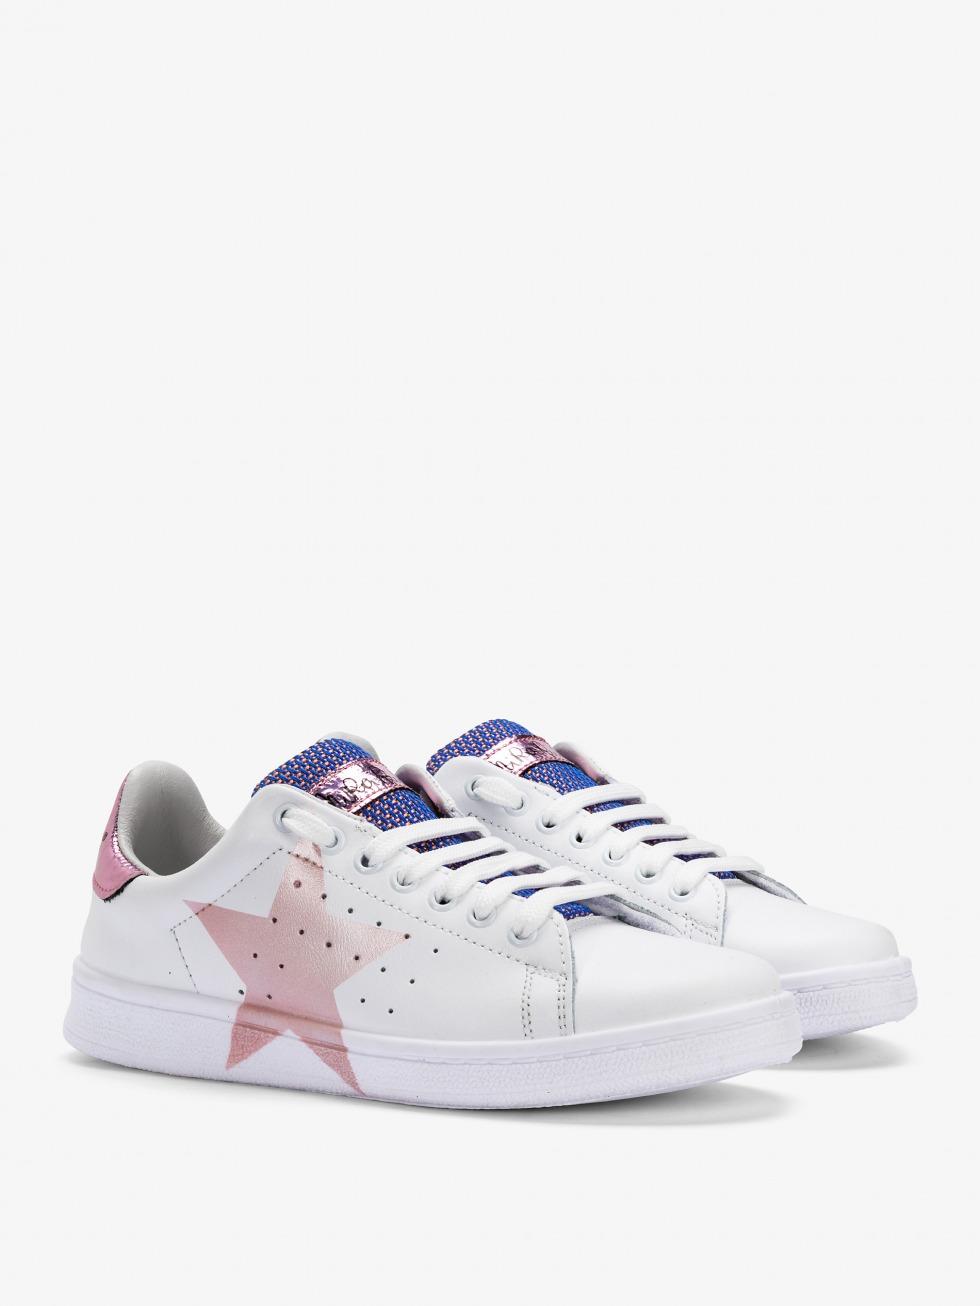 Daiquiri Sneakers - Space Orchidea Star